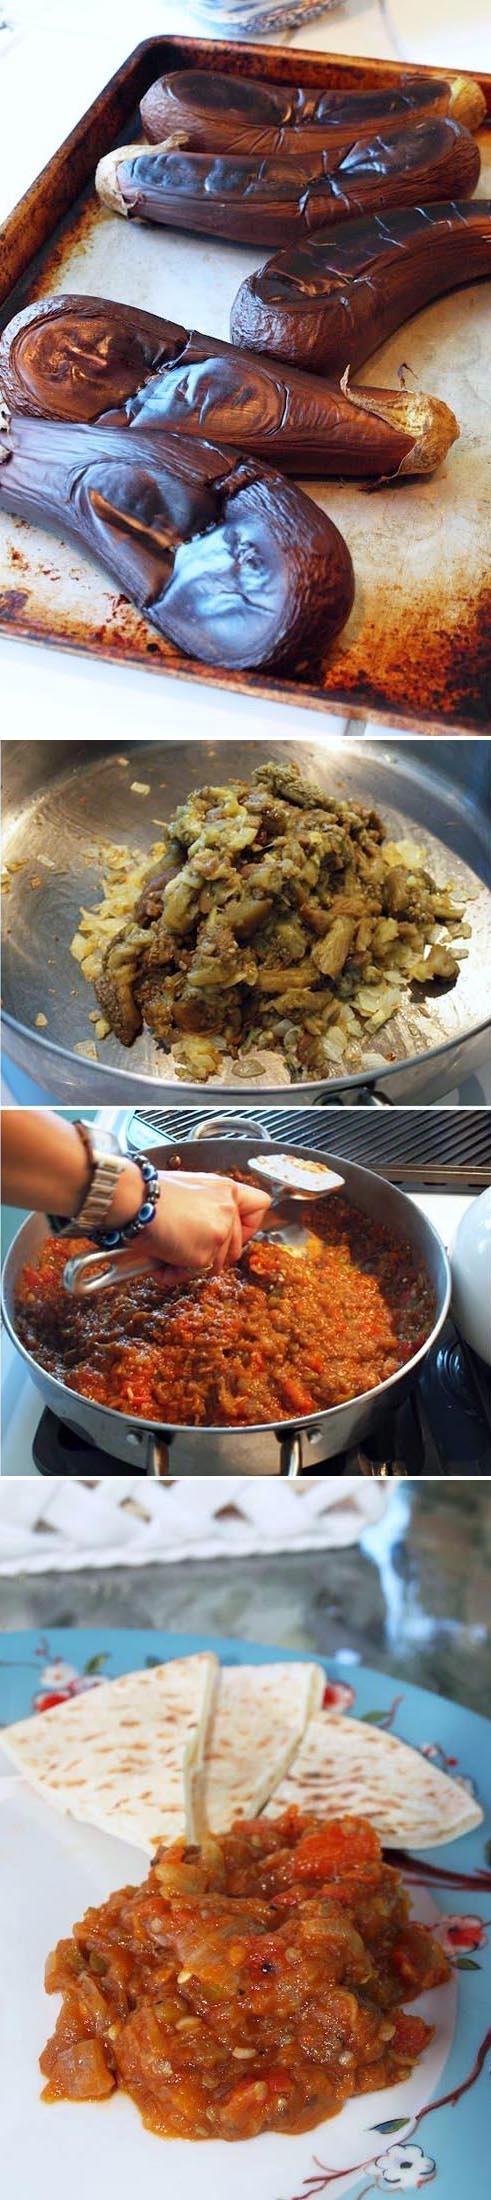 Poor Man's Eggplant Caviar | BAKLAZHANNAYA IKRA, ©cookthehelloutofit #glutenfree #vegan #starter